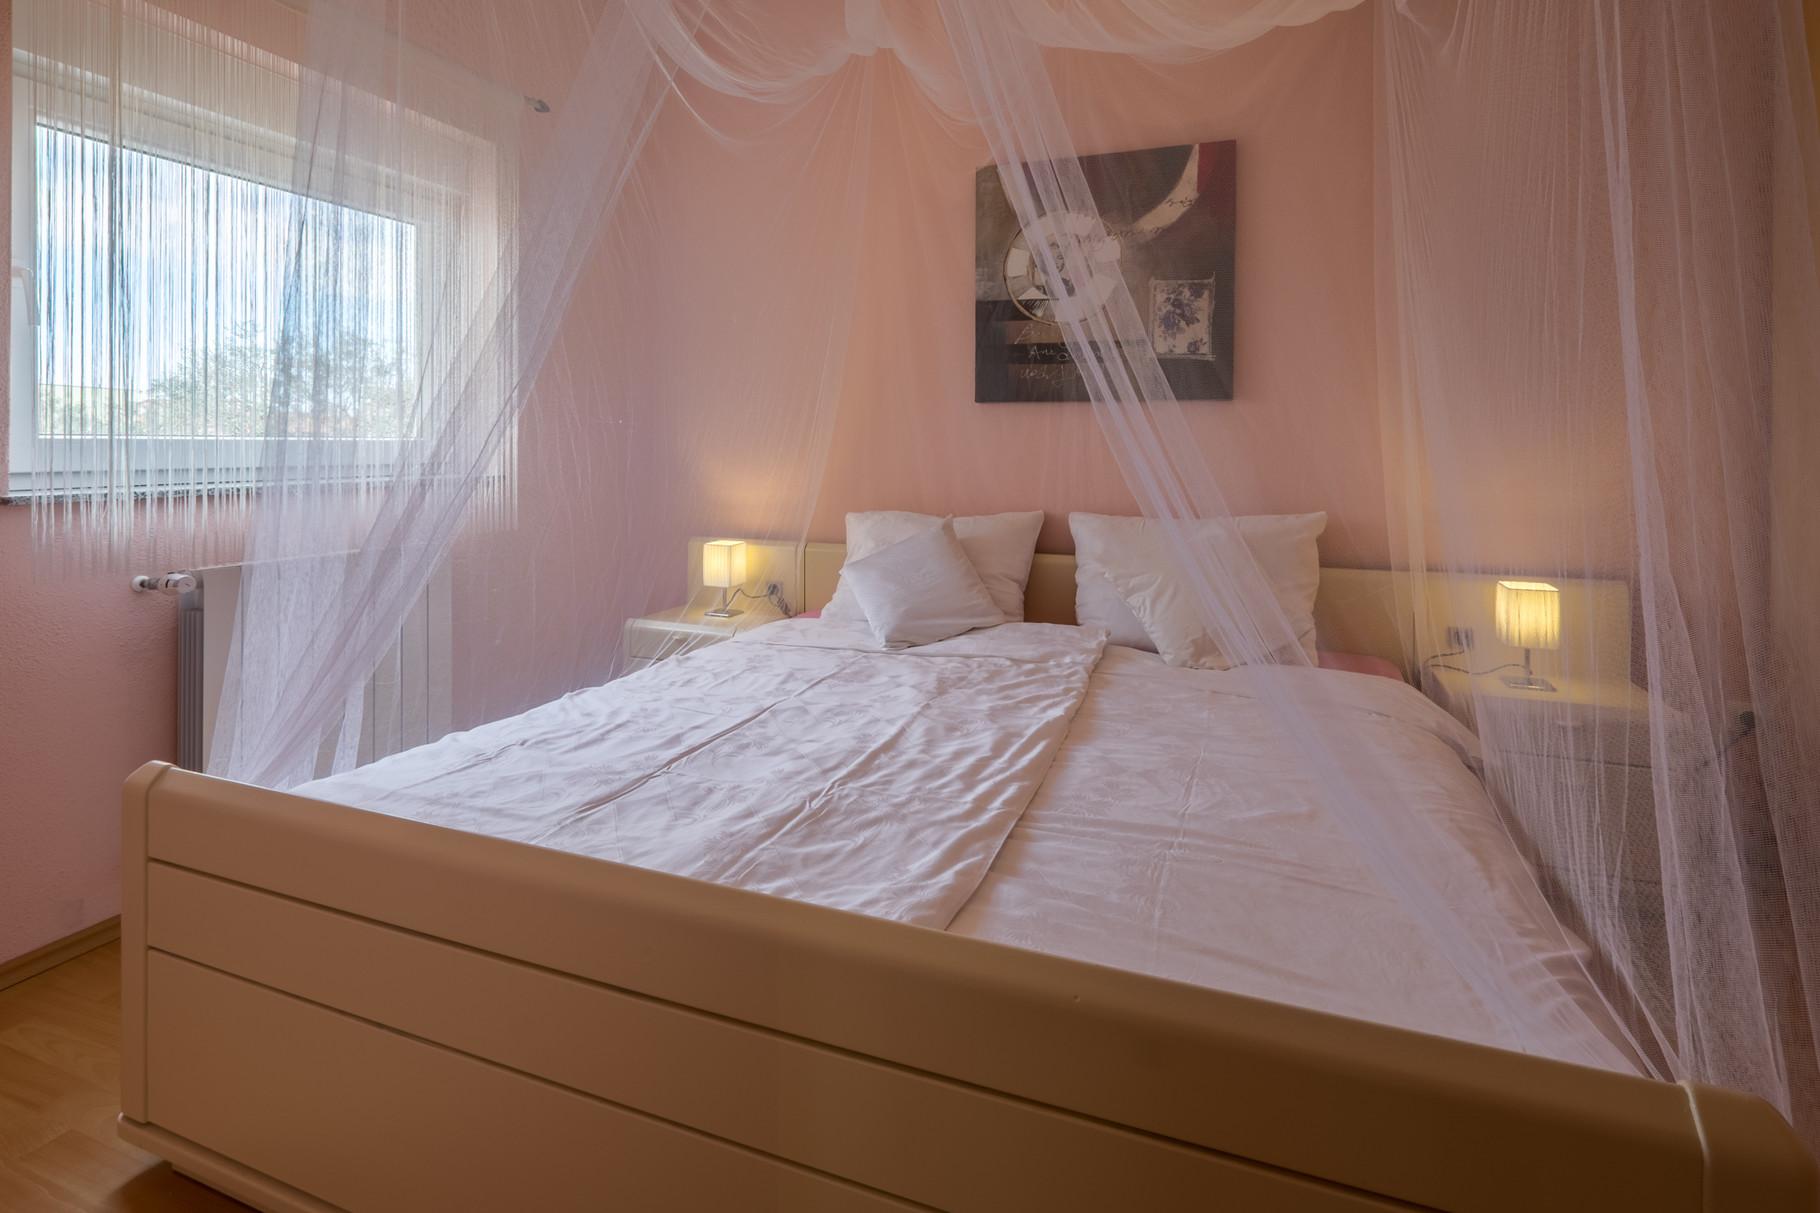 Schlafzimmer Nr 2, Doppelbett 180x200